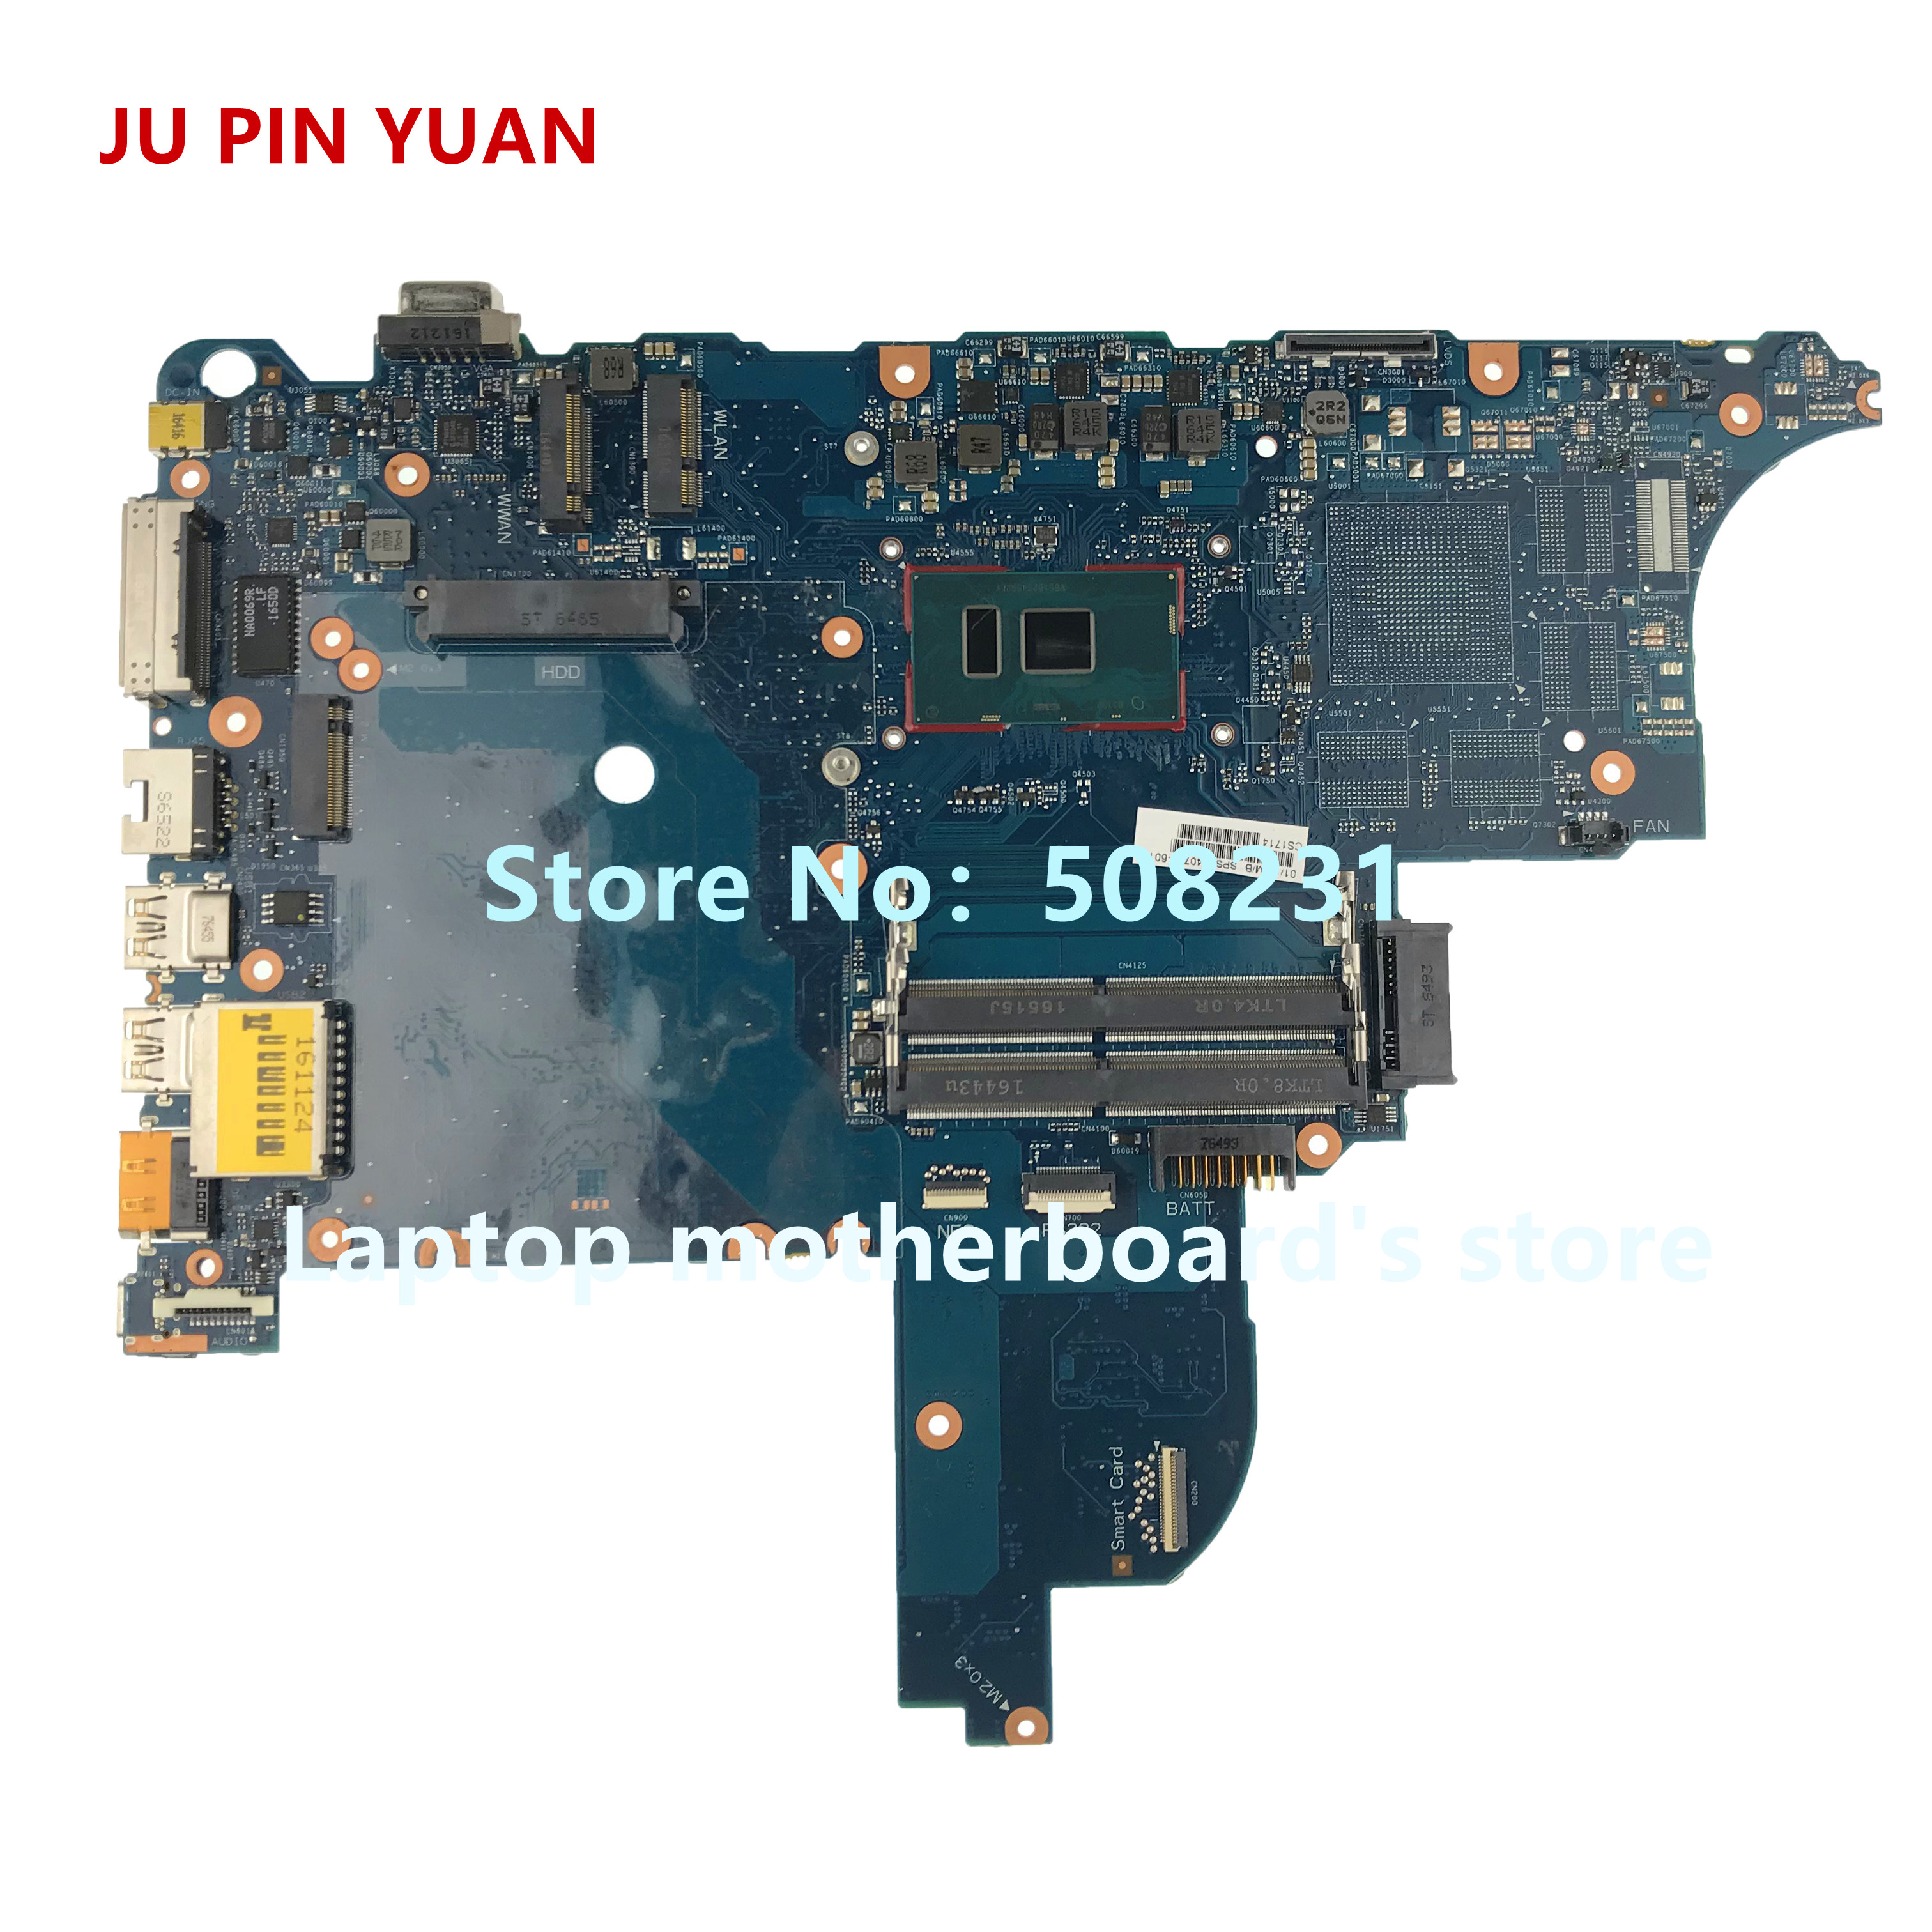 Laptop Zubehör Laptop Motherboard Ju Pin Yuan Für Hp Probook 640 650 G2 Laptop Motherboard 840716-601 840716-001 6050a2723701-mb-a02 I5-6200u Voll Getestet